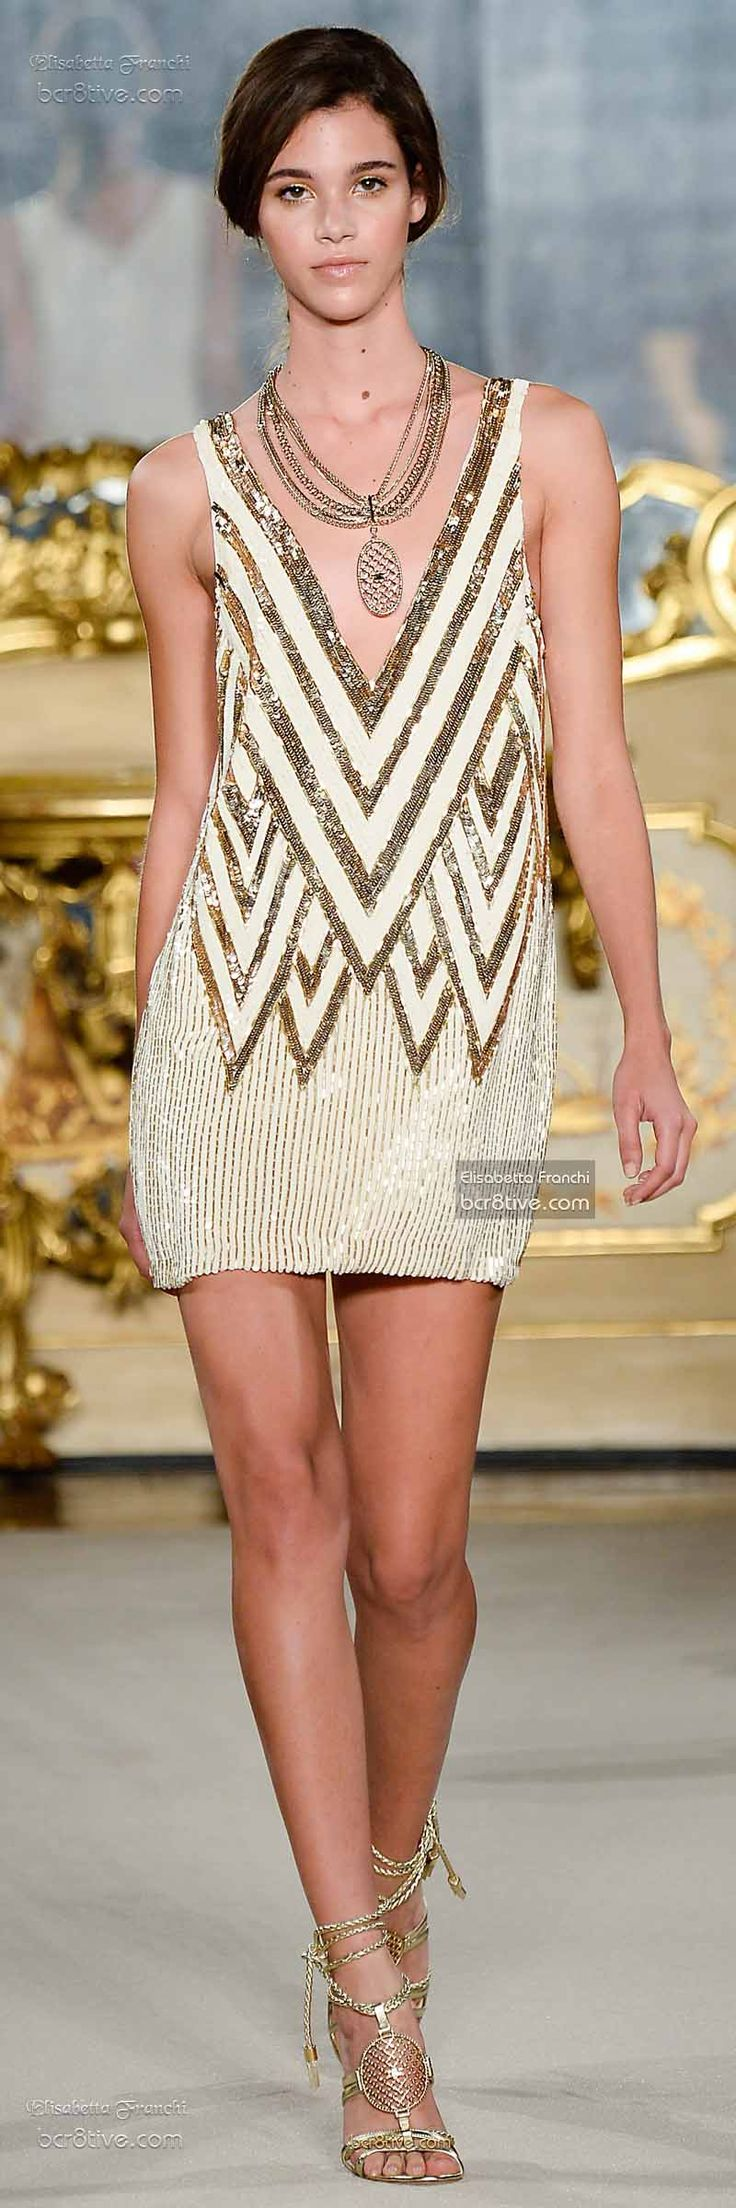 Dress The Best! Designer Dress Fashion Runway Style Elisabetta Franchi Spring 2015-16